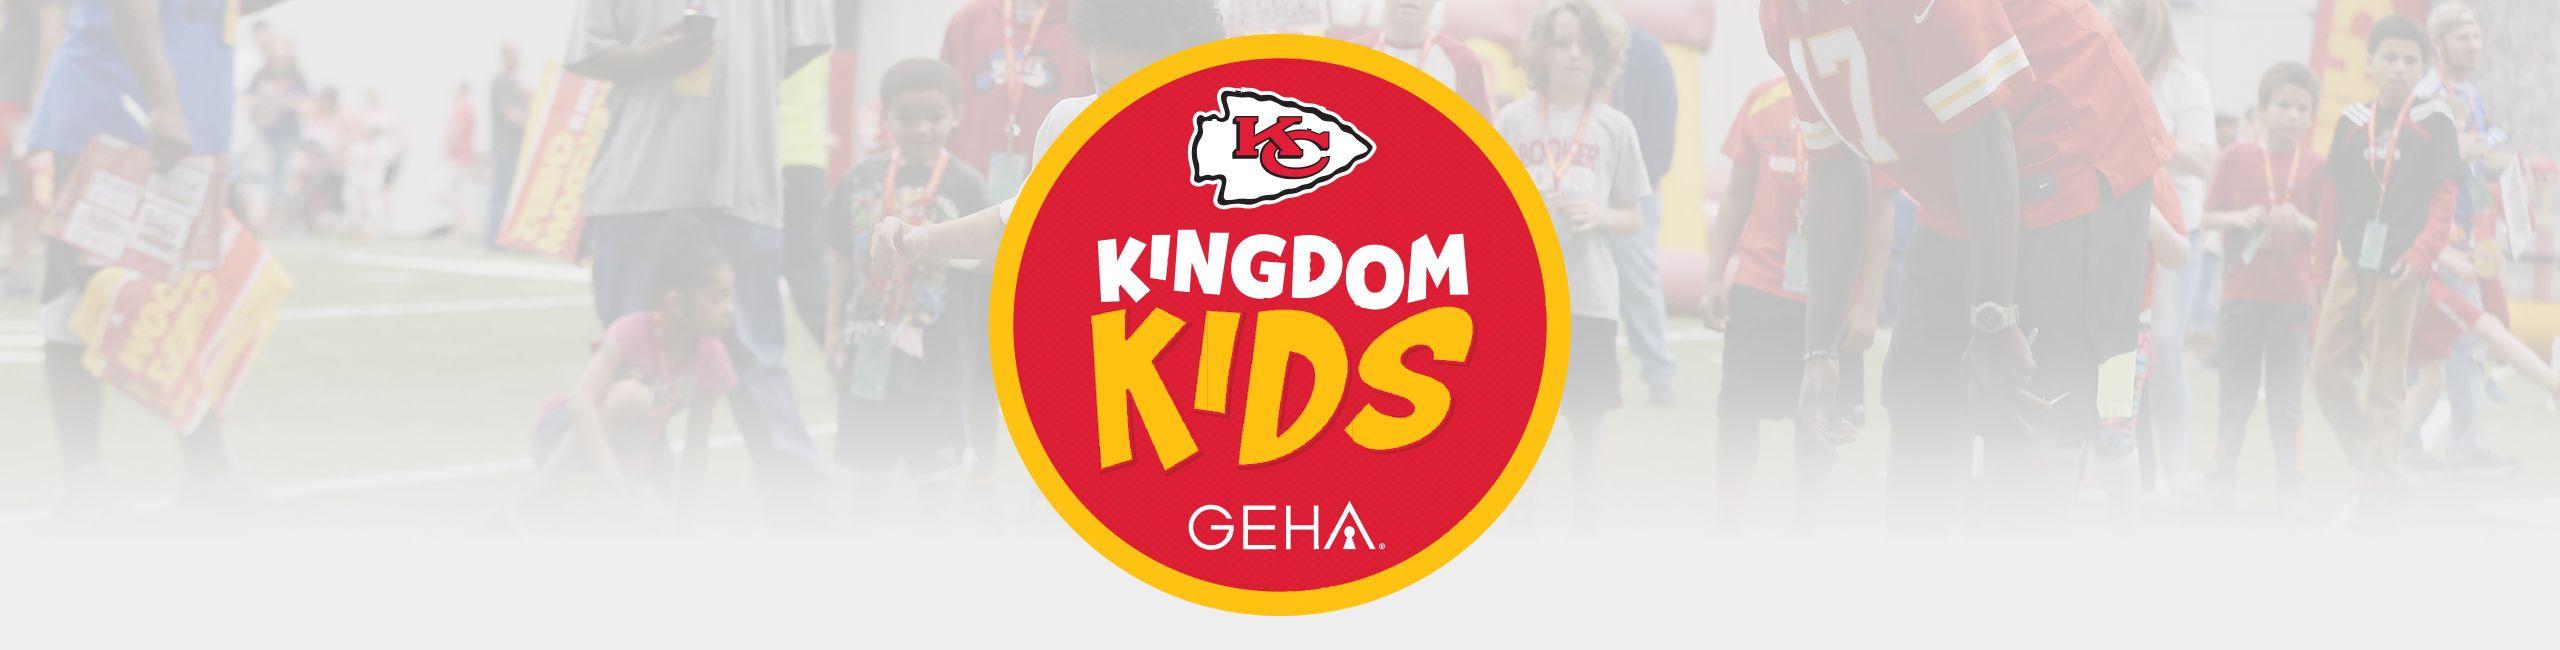 Kingdom-Kids-Header